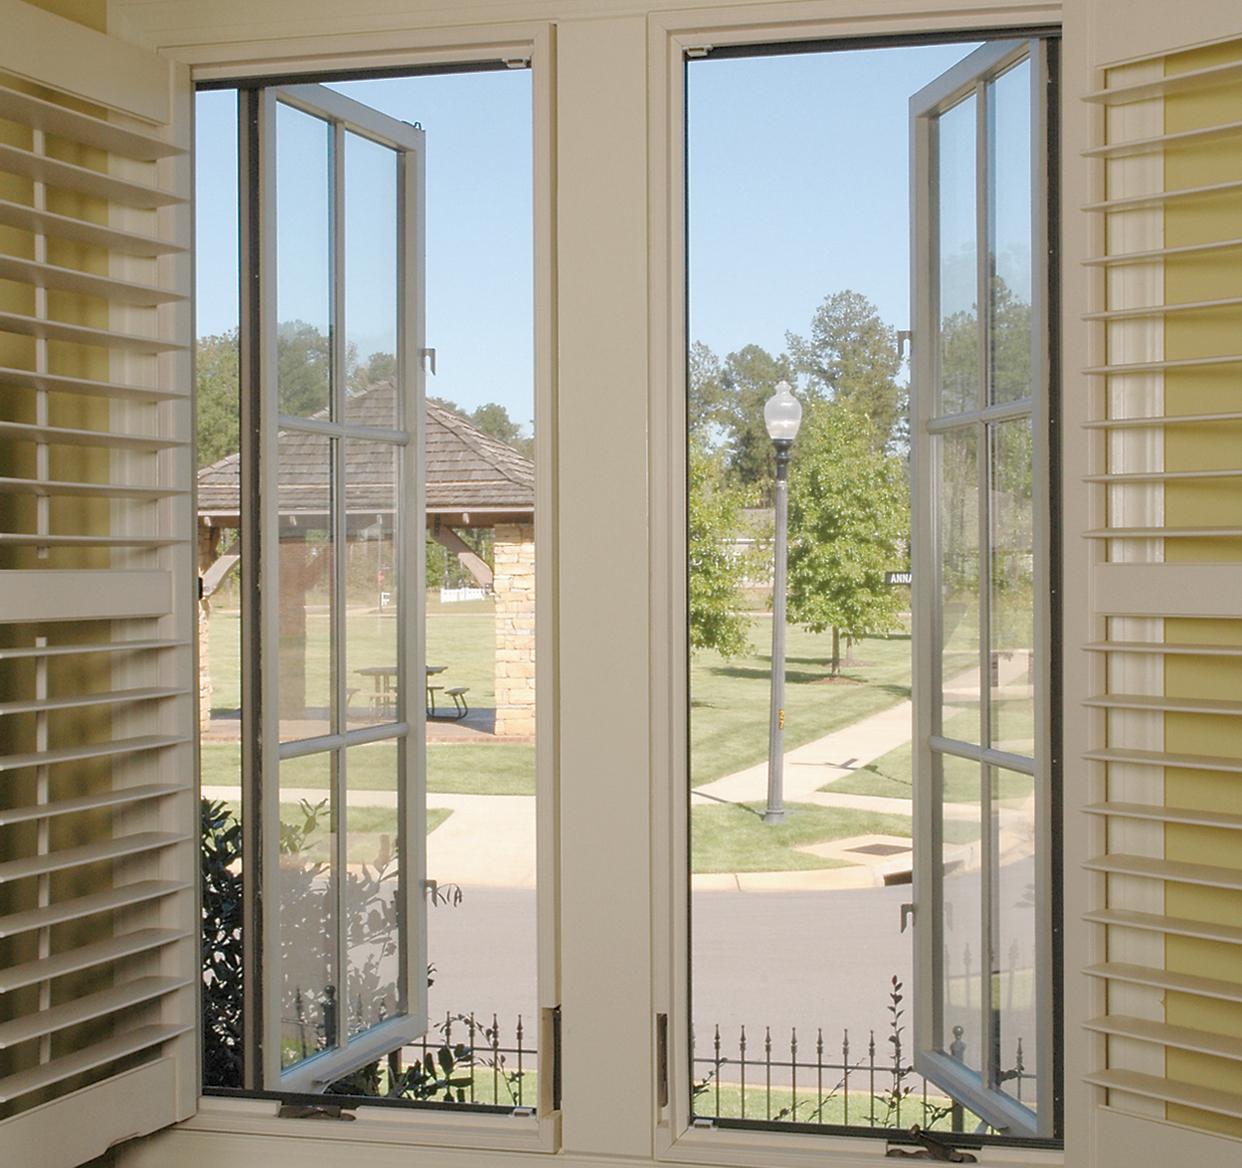 ultravue-window-pic-47517.1475085365.1280.1280.jpg